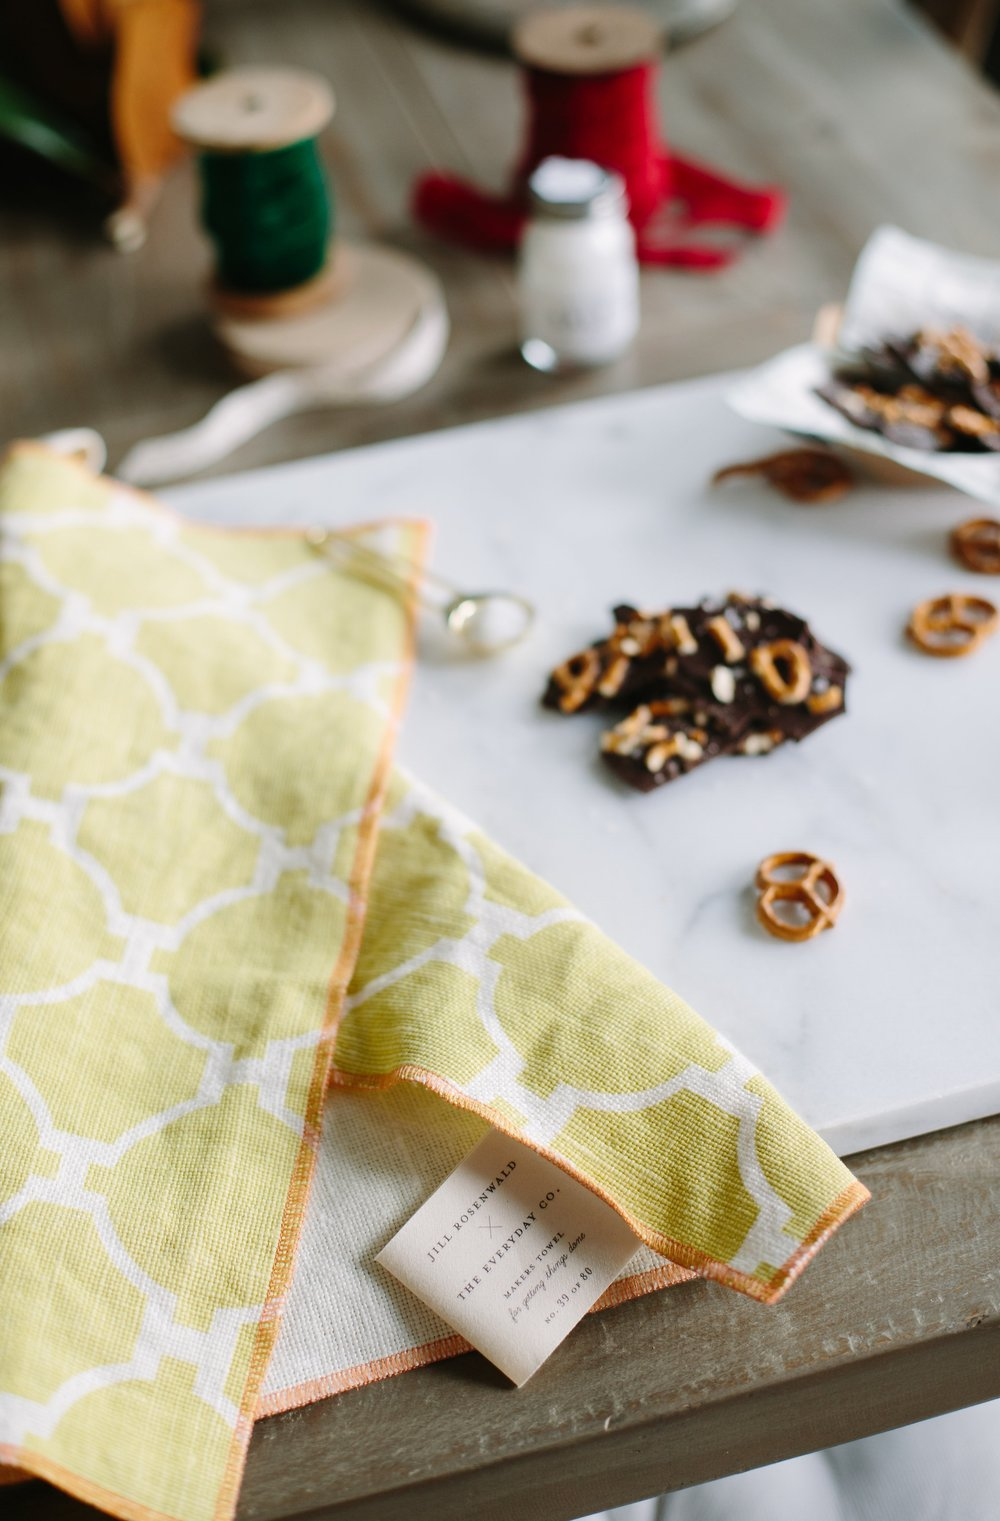 jill-rosenwald-linen-towel-kathryn-yee-simple-holiday-bark-chocolate-recipe